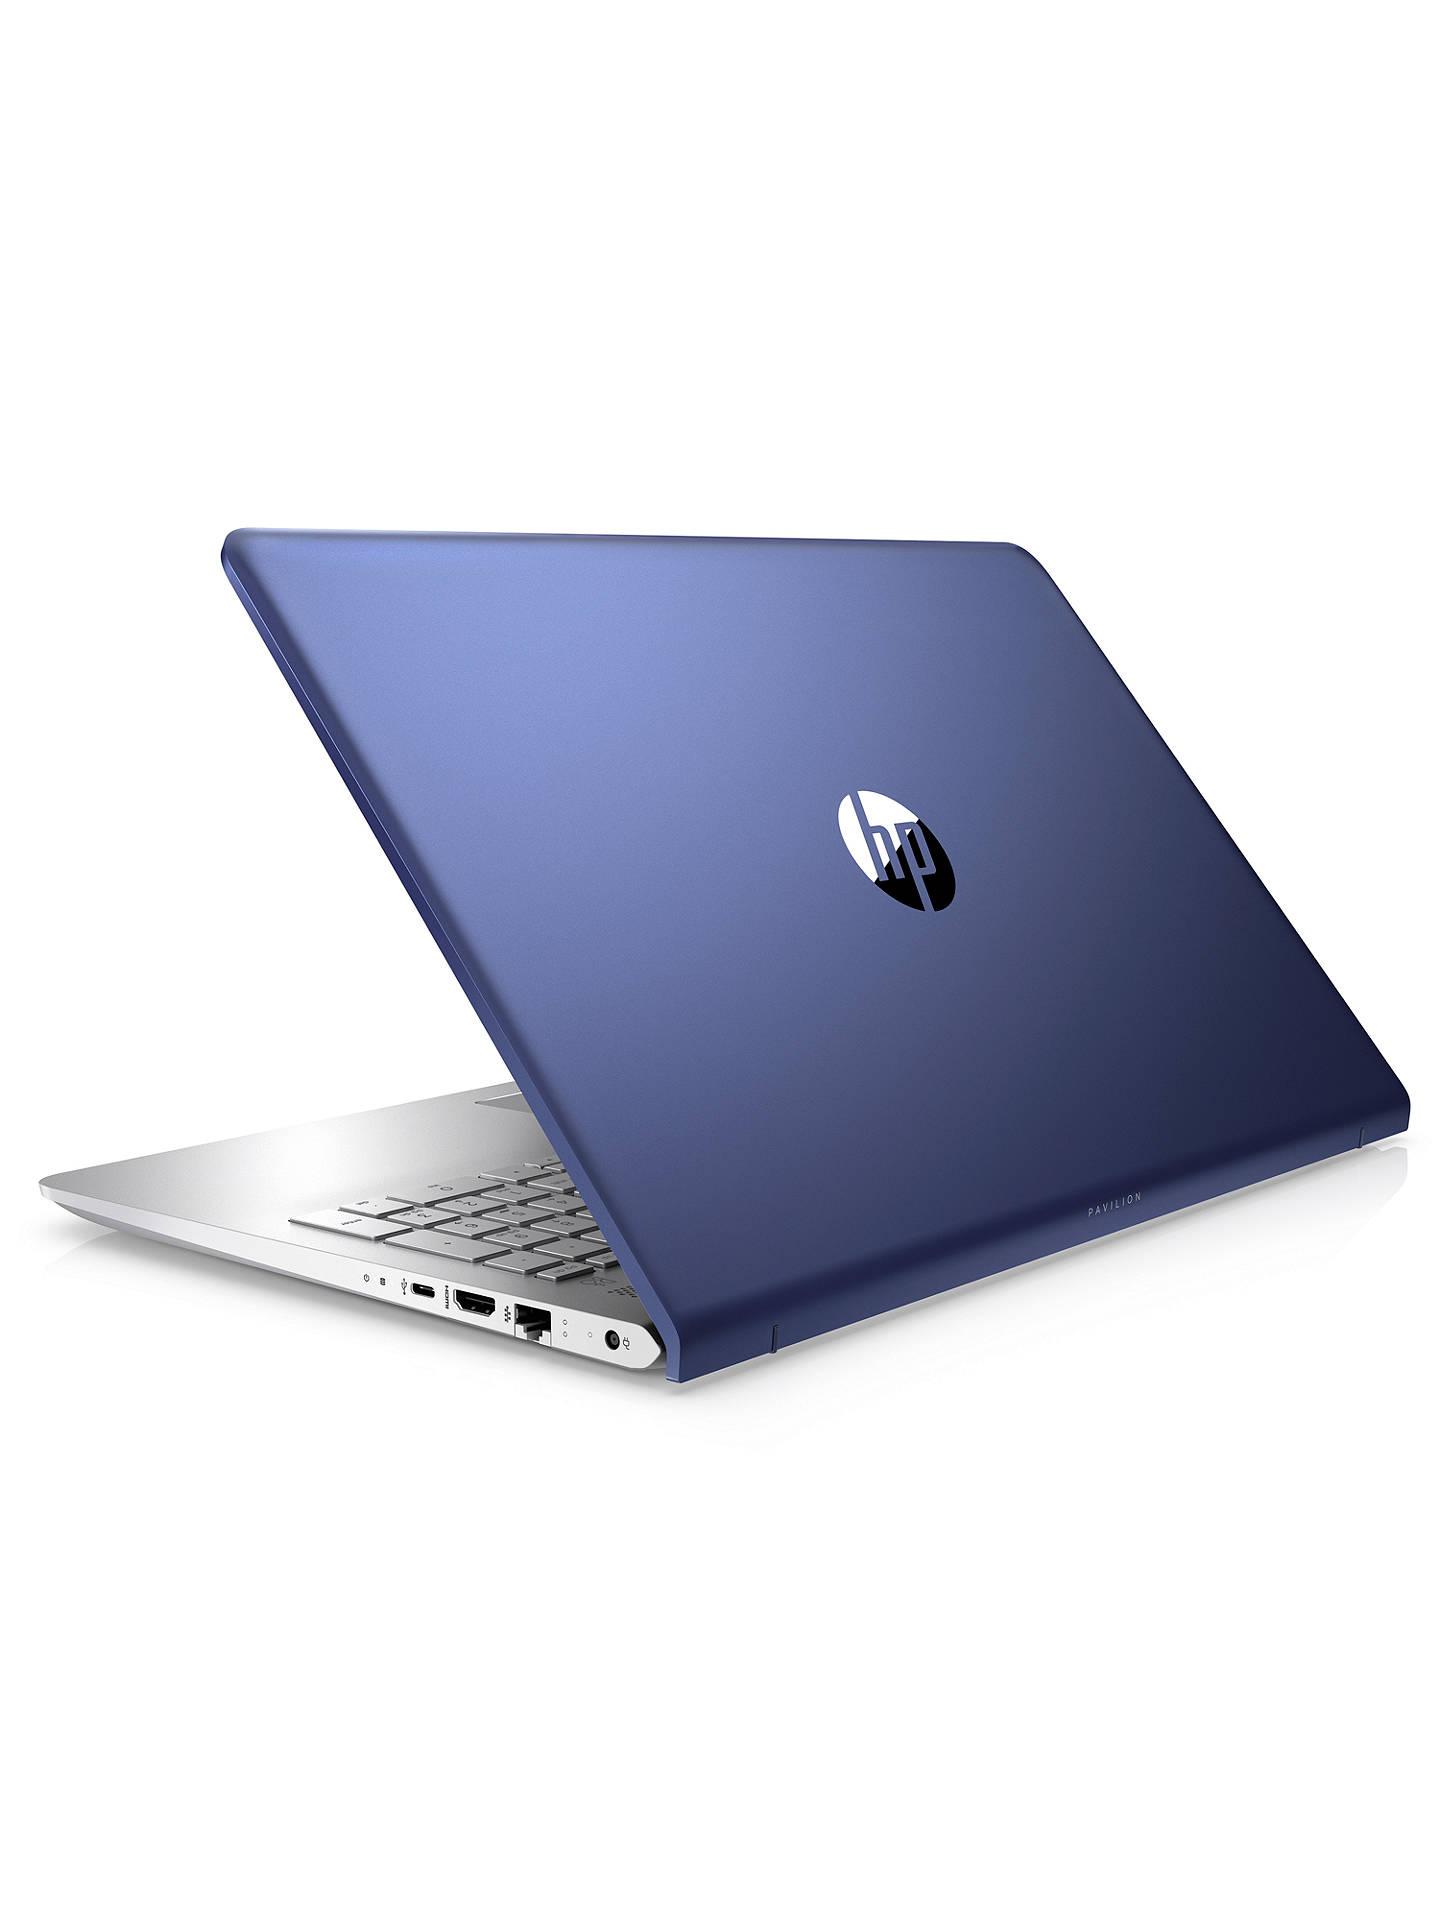 "HP Pavilion 15 Laptop, Intel Core i3, 8GB RAM, 1TB, 15 6"" Full HD at"